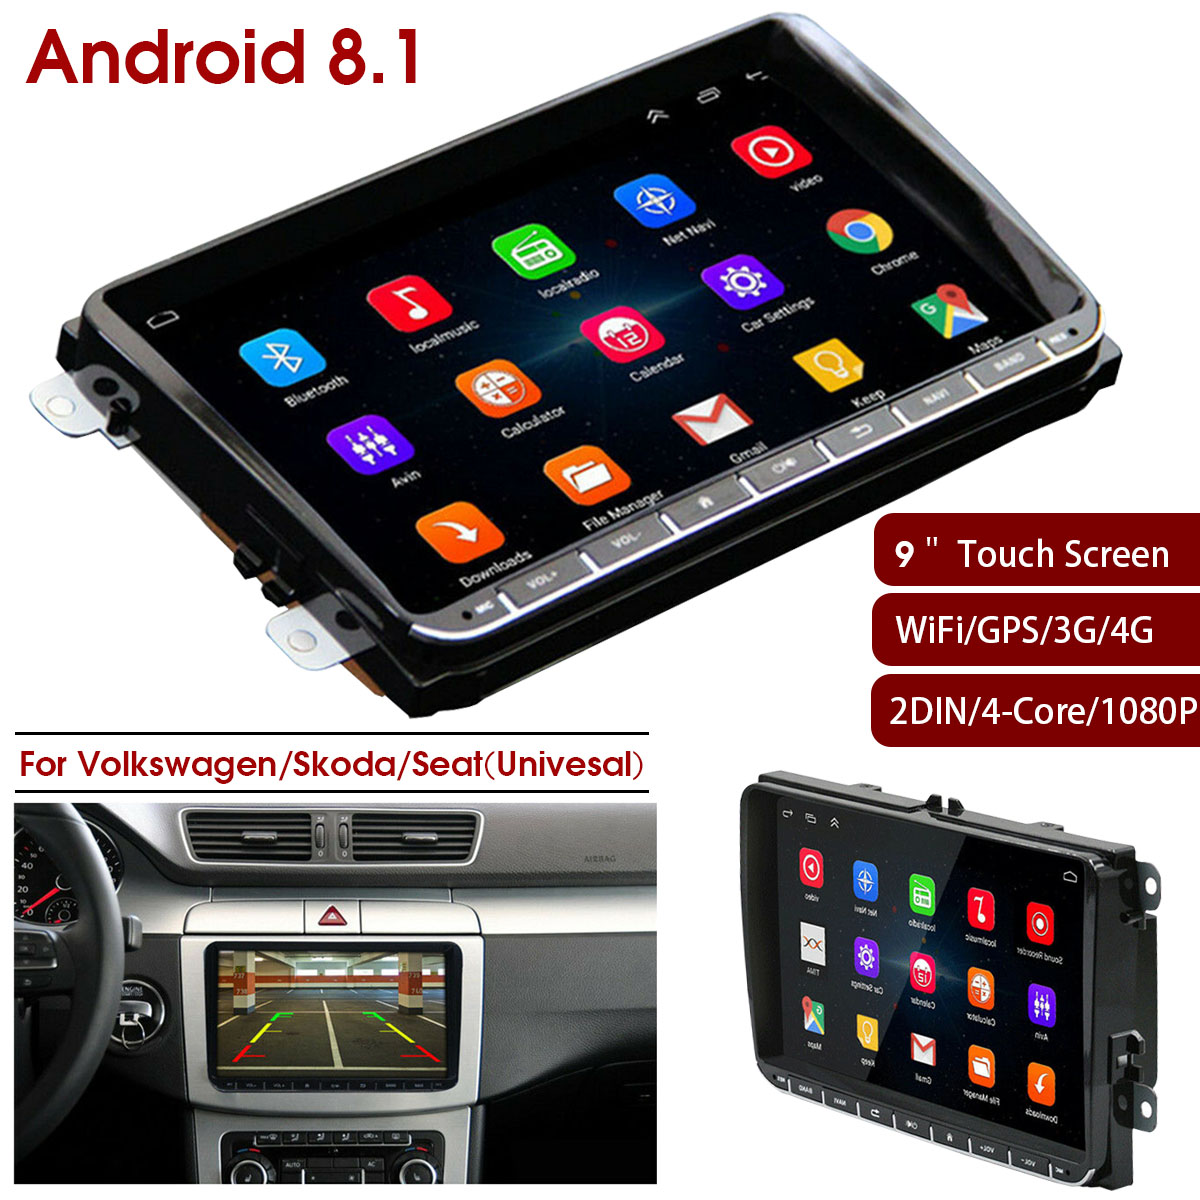 9inch HD Car GPS Navigation FM Bluetooth Touches Screen Truck gps Upgrade Sat nav Automobile Gps Navigators High Quality sat nav